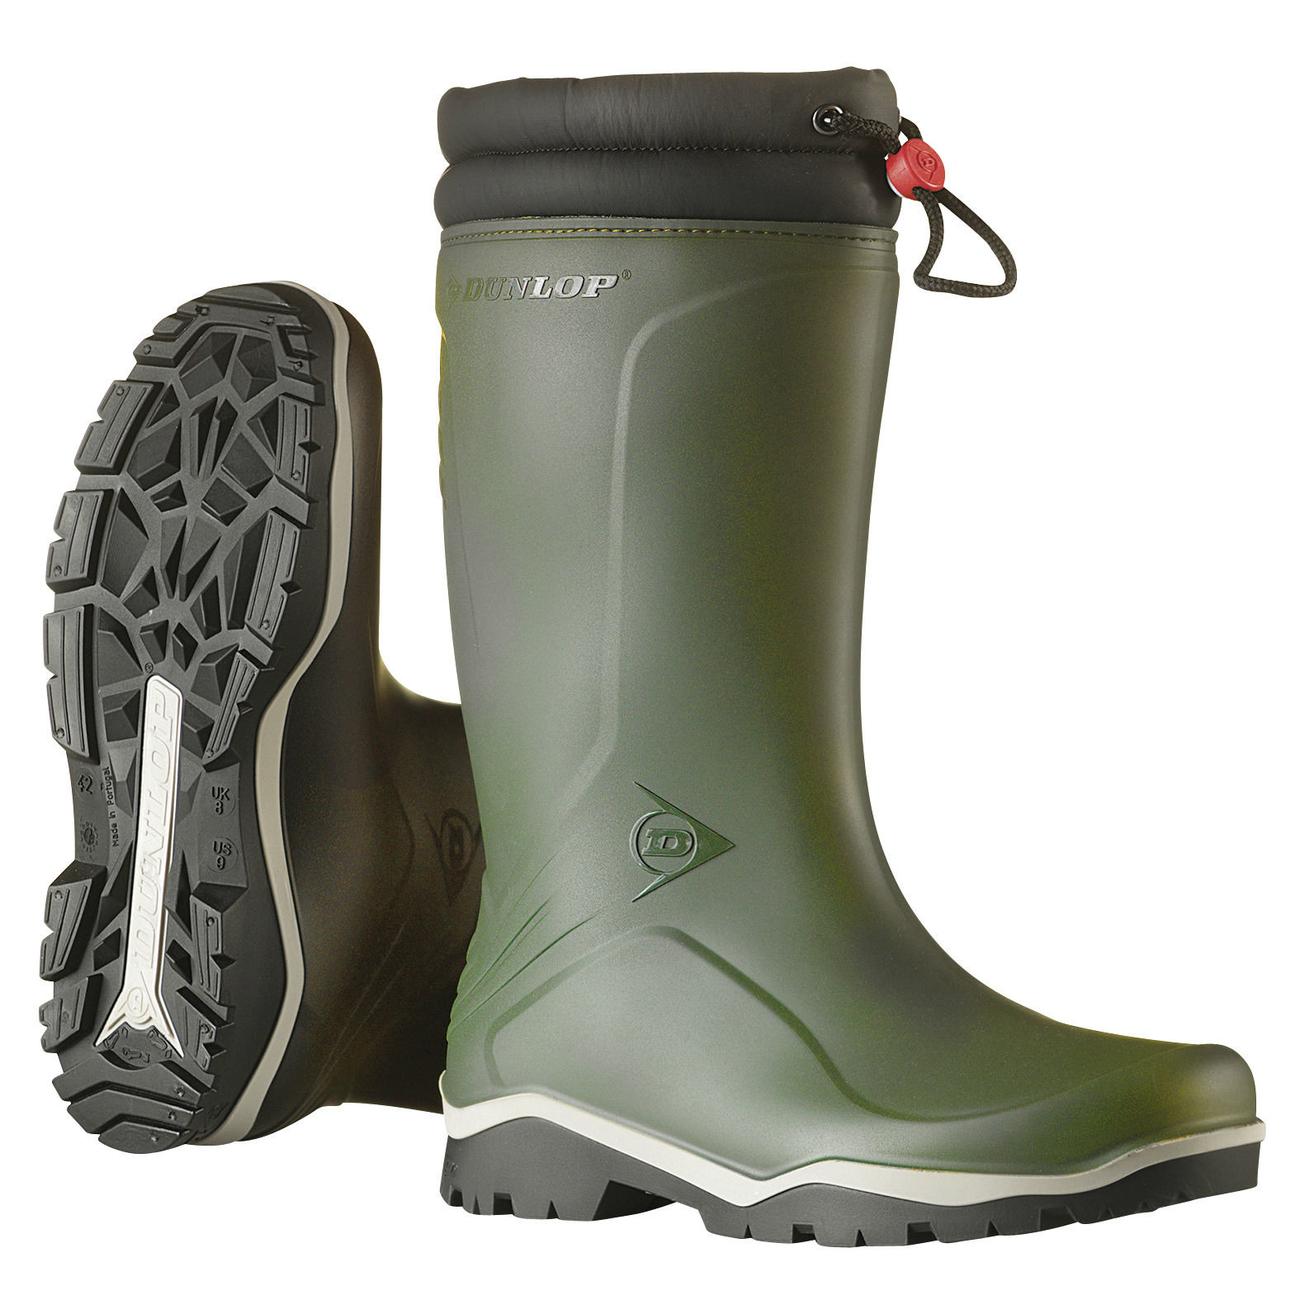 Dunlop Blizzard Winterstiefel